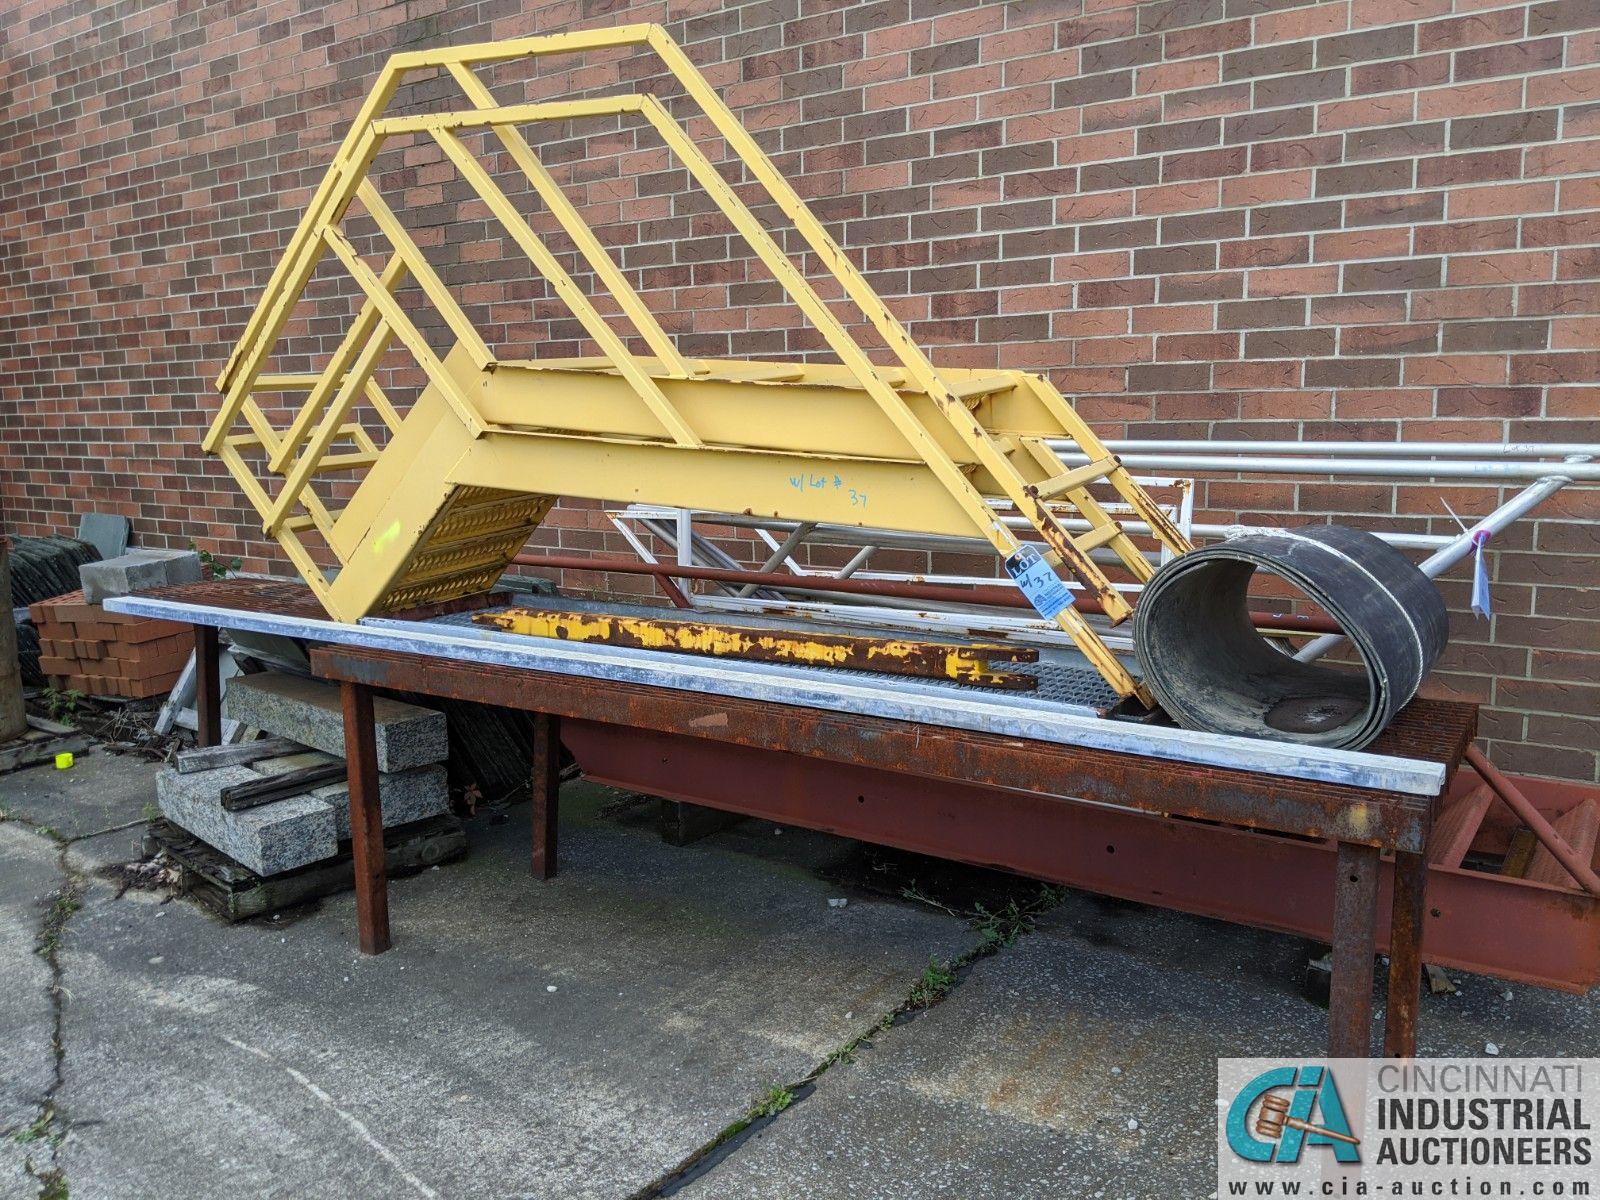 (LOT) ALUMINUM STEEL FRAME STEPS & STEEL TABLE (8635 East Ave., Mentor, OH 44060 - John Magnasum: - Image 3 of 3